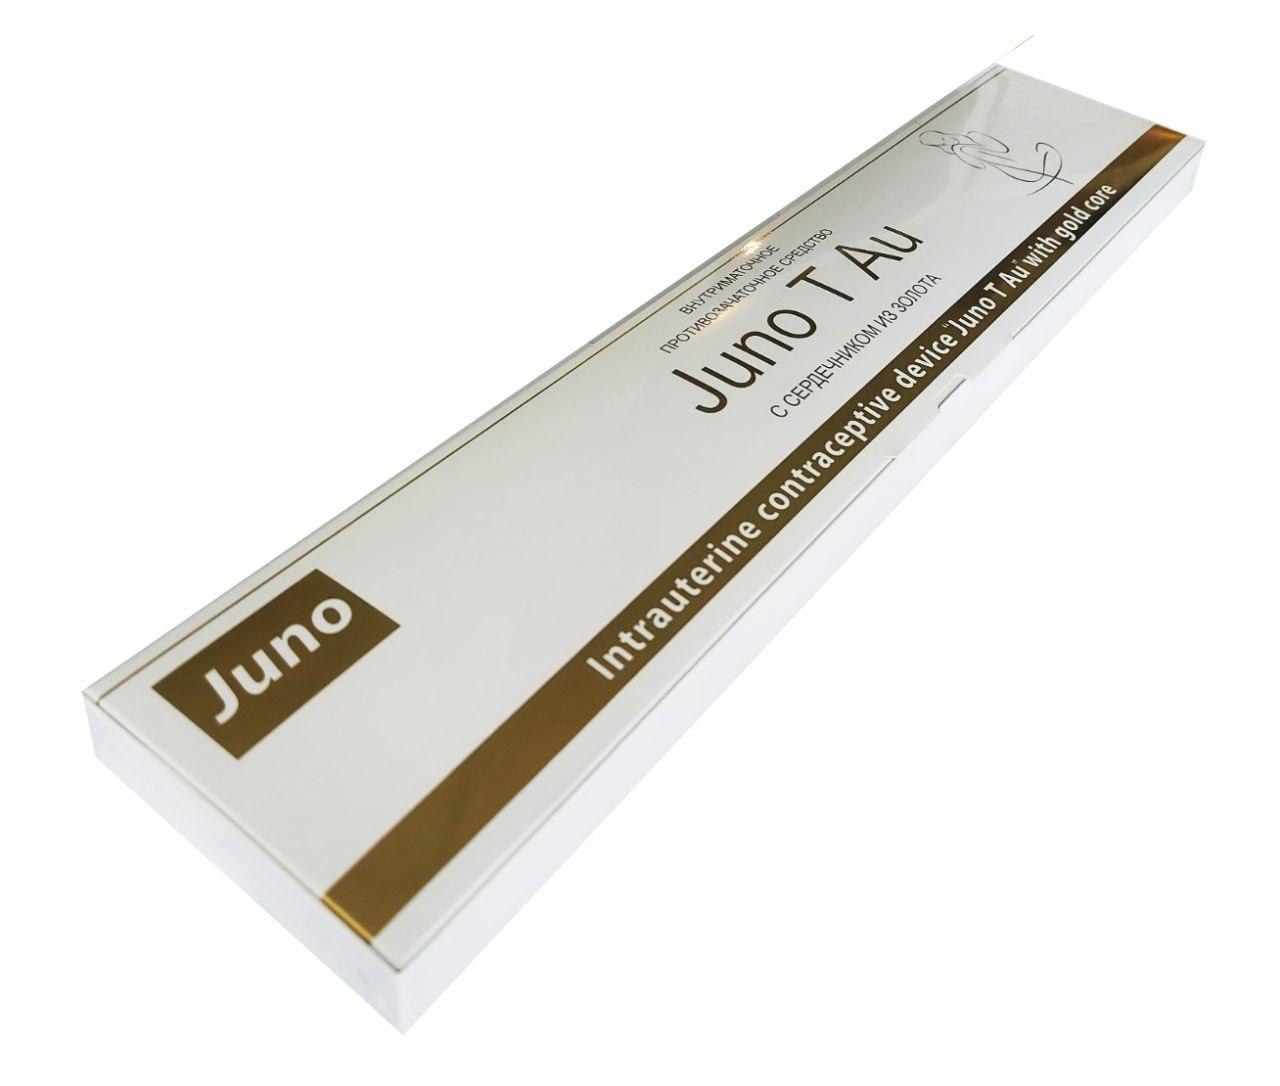 Внутриматочная спираль Юнона Juno Au - Фото 3